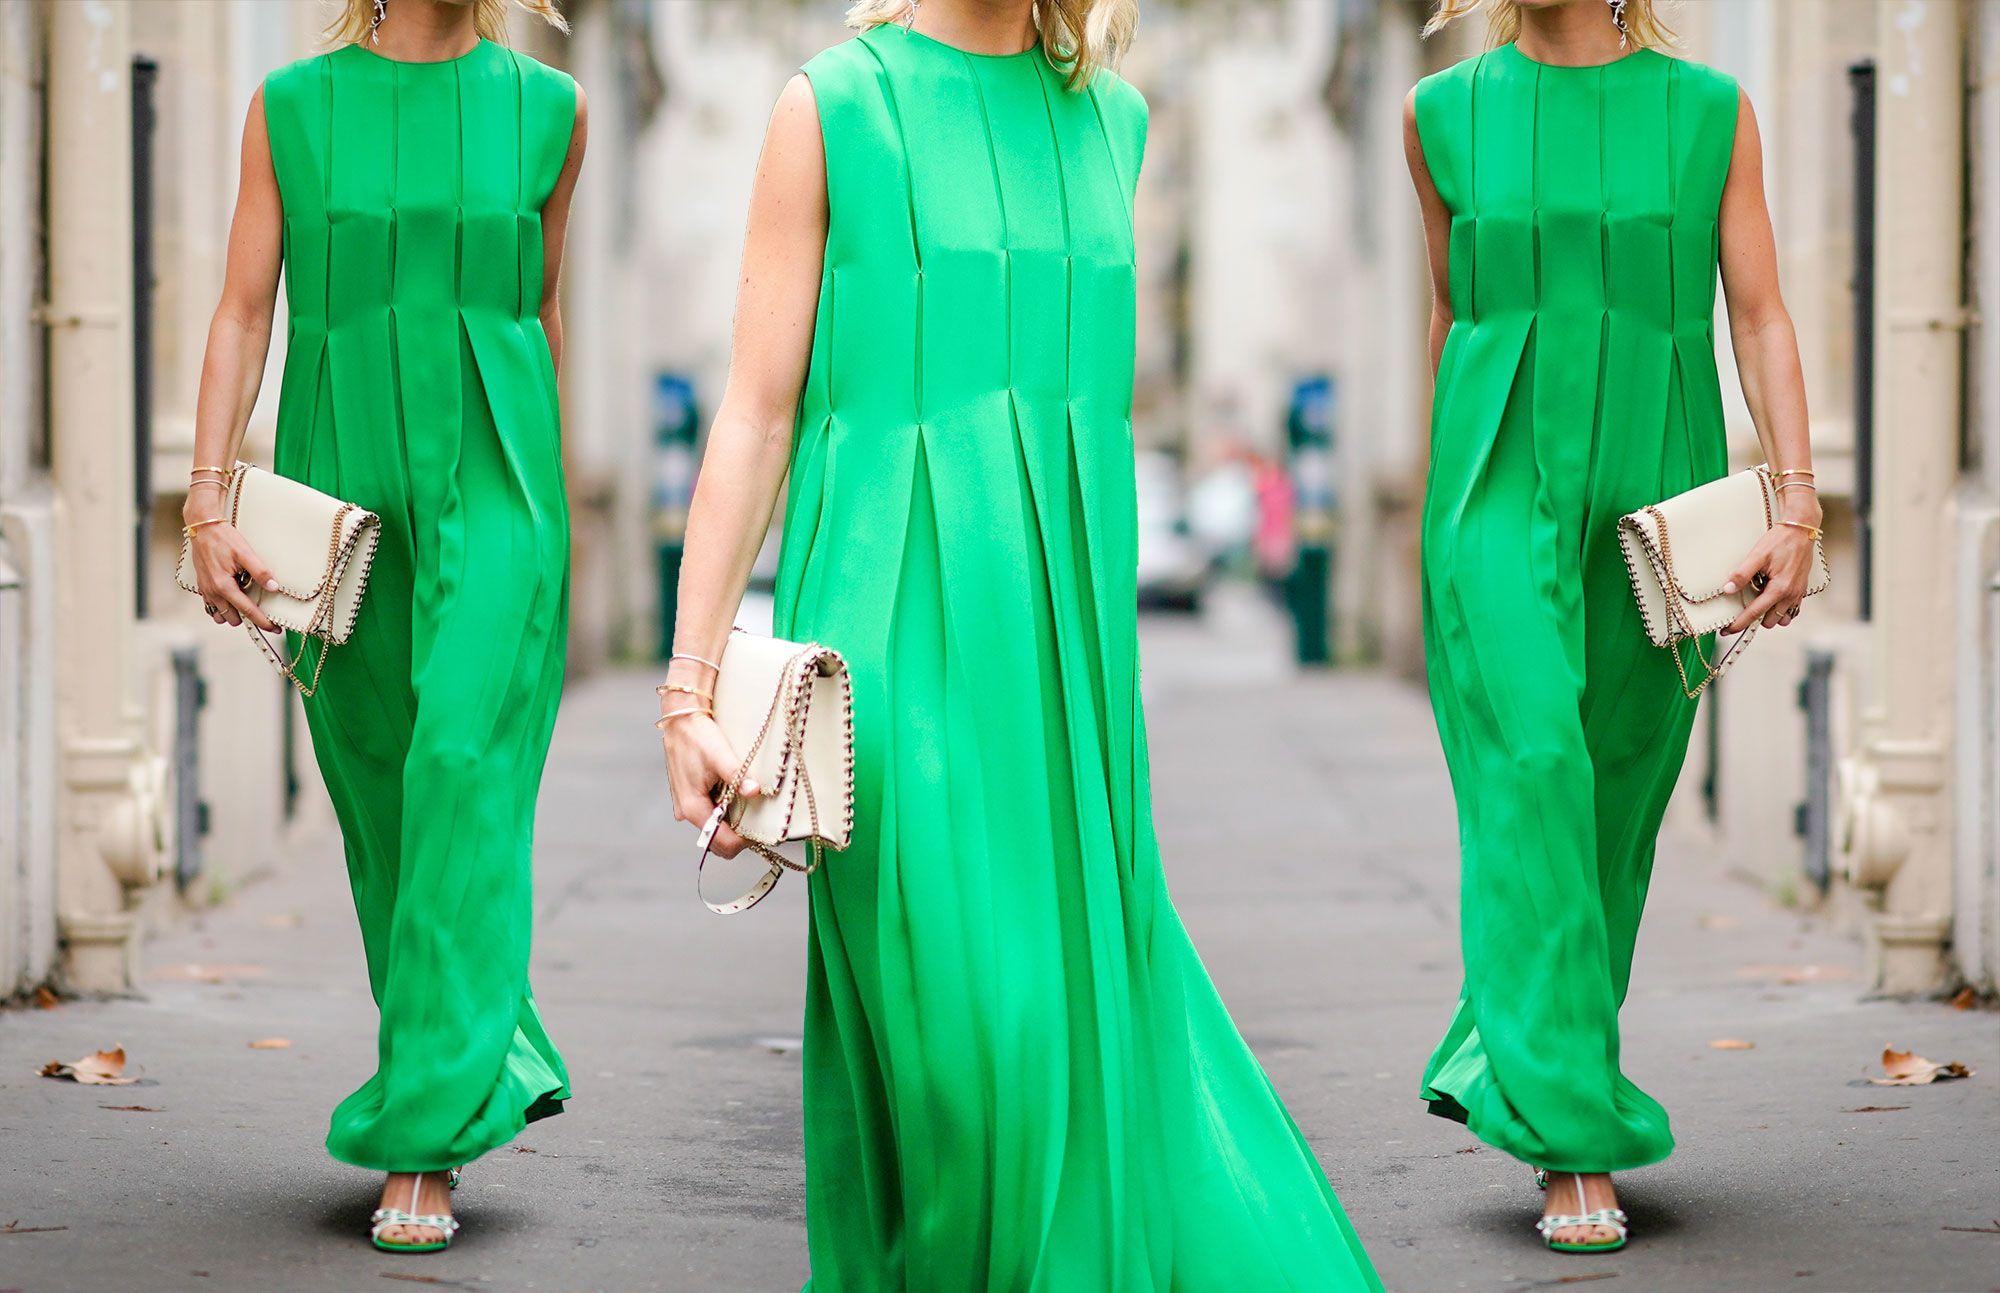 Vestiti verdi  11 look in verde top b3e51981fc2